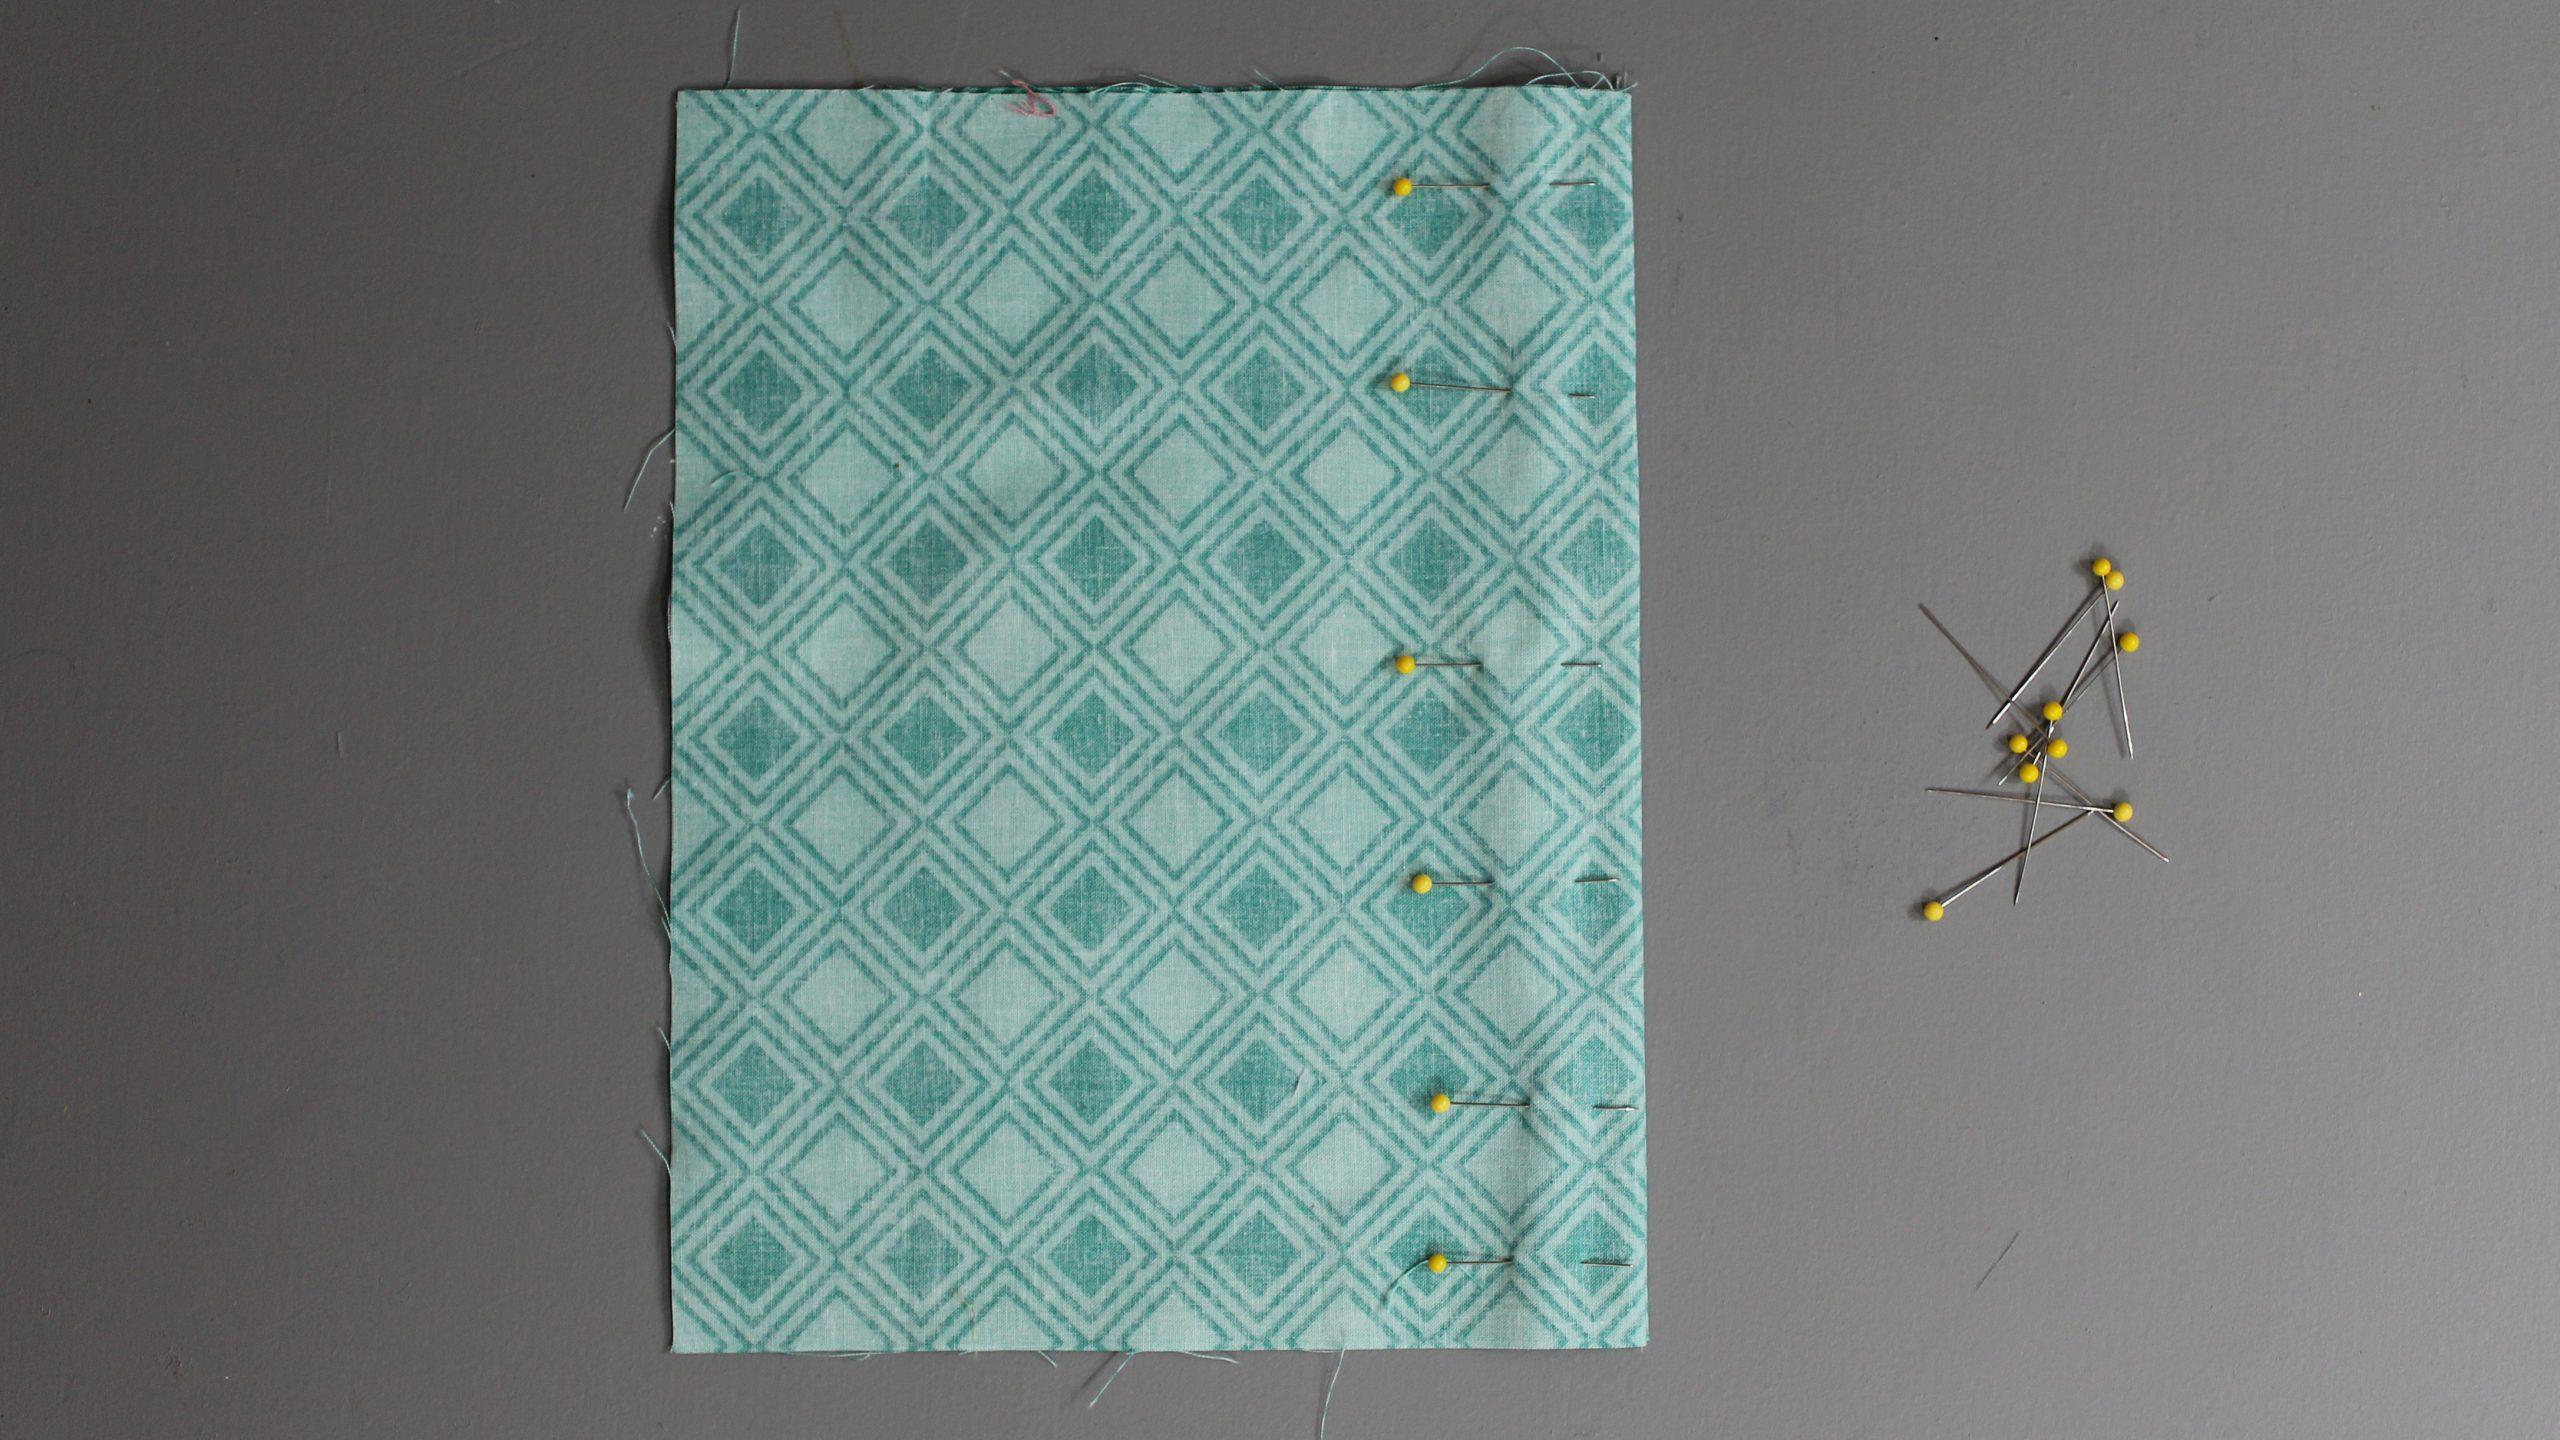 Pinning the fabric